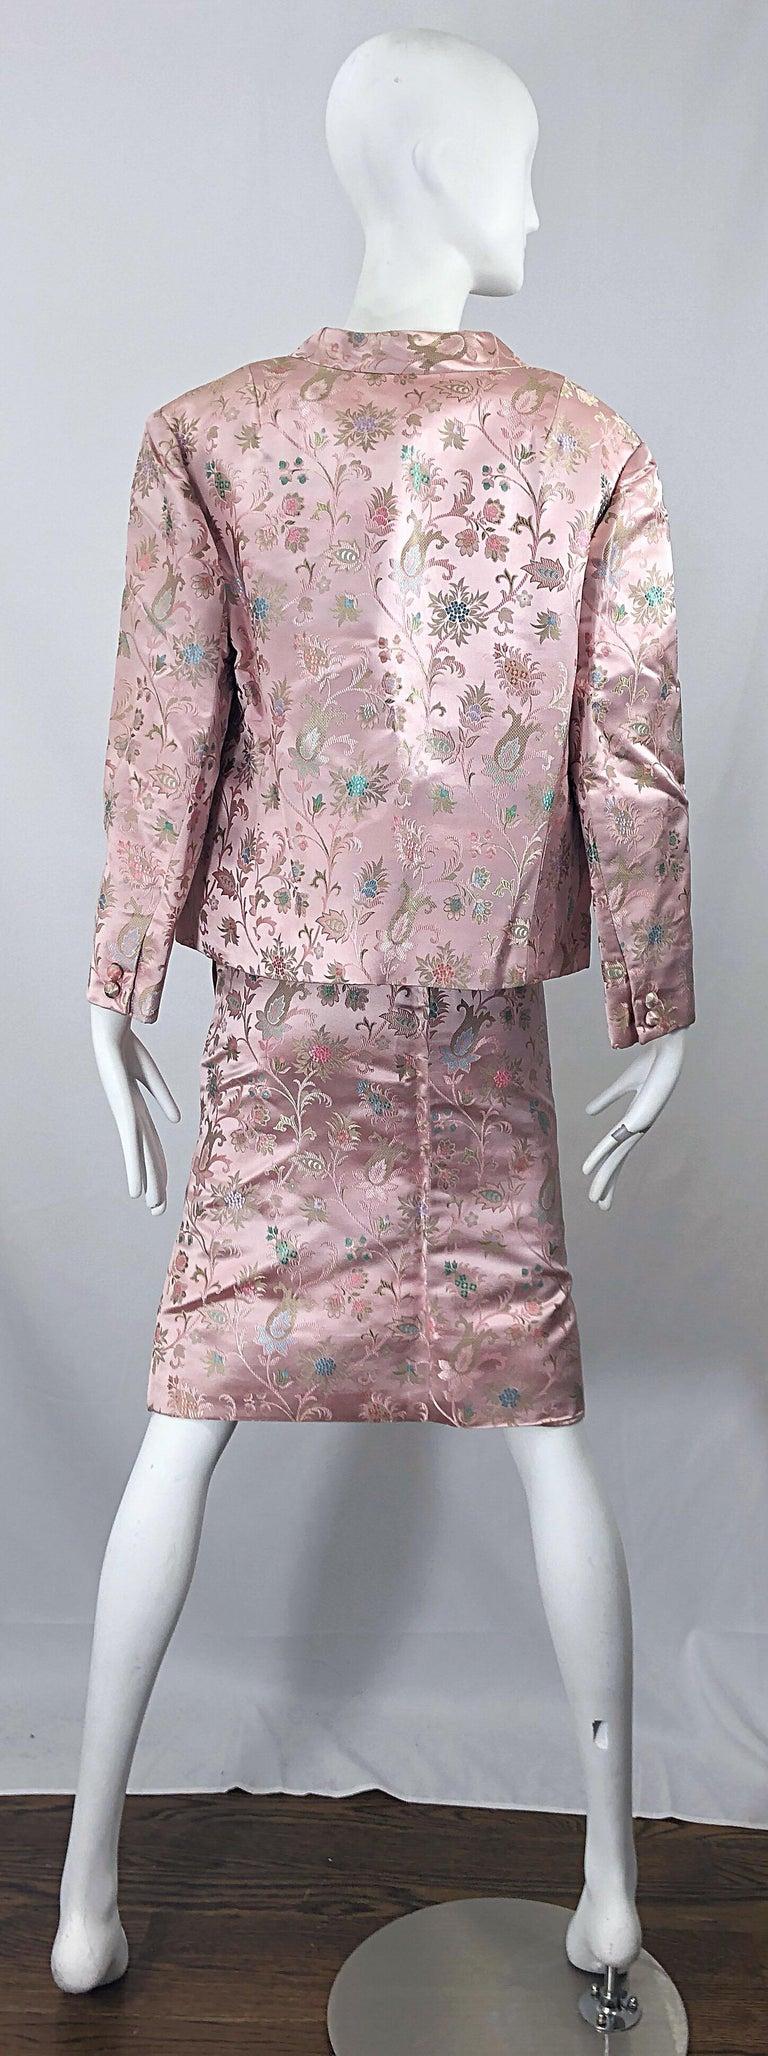 Dynasty 1960s For Lord & Taylor Light Pink Large Size 3 Piece Vintage Dress Set For Sale 5